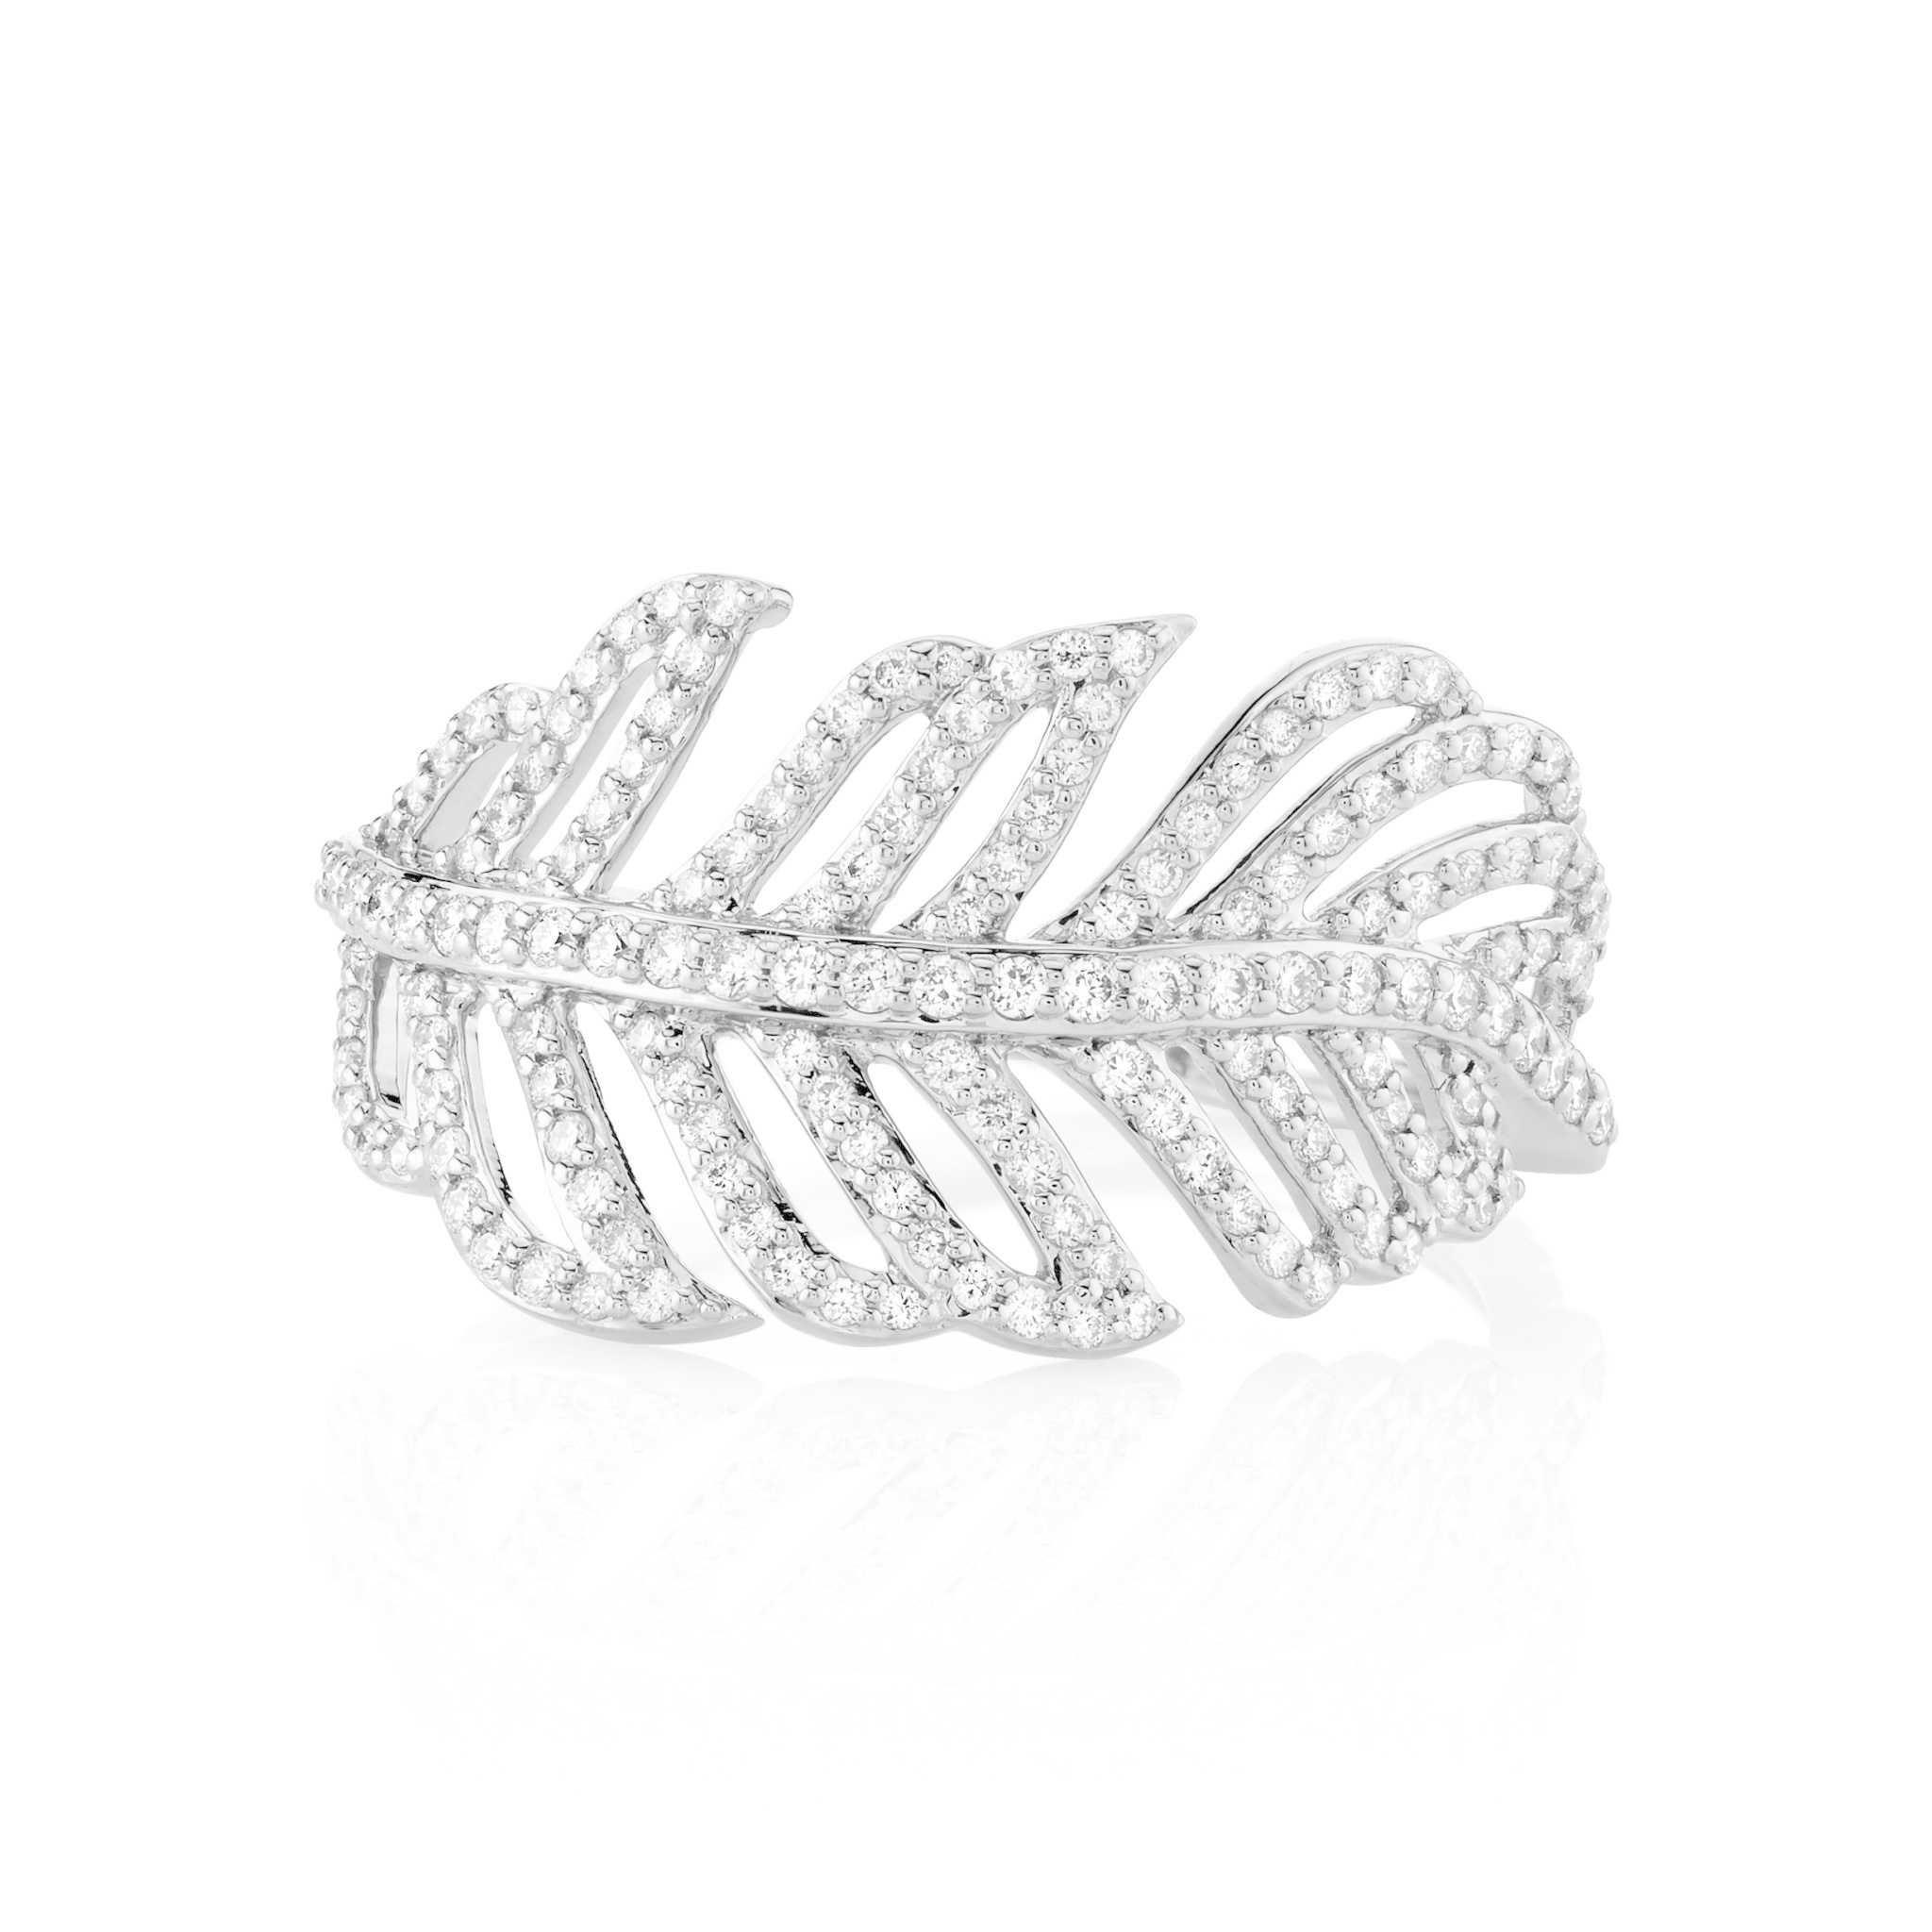 Feather Ring with White Diamond Detail 18K White Gold